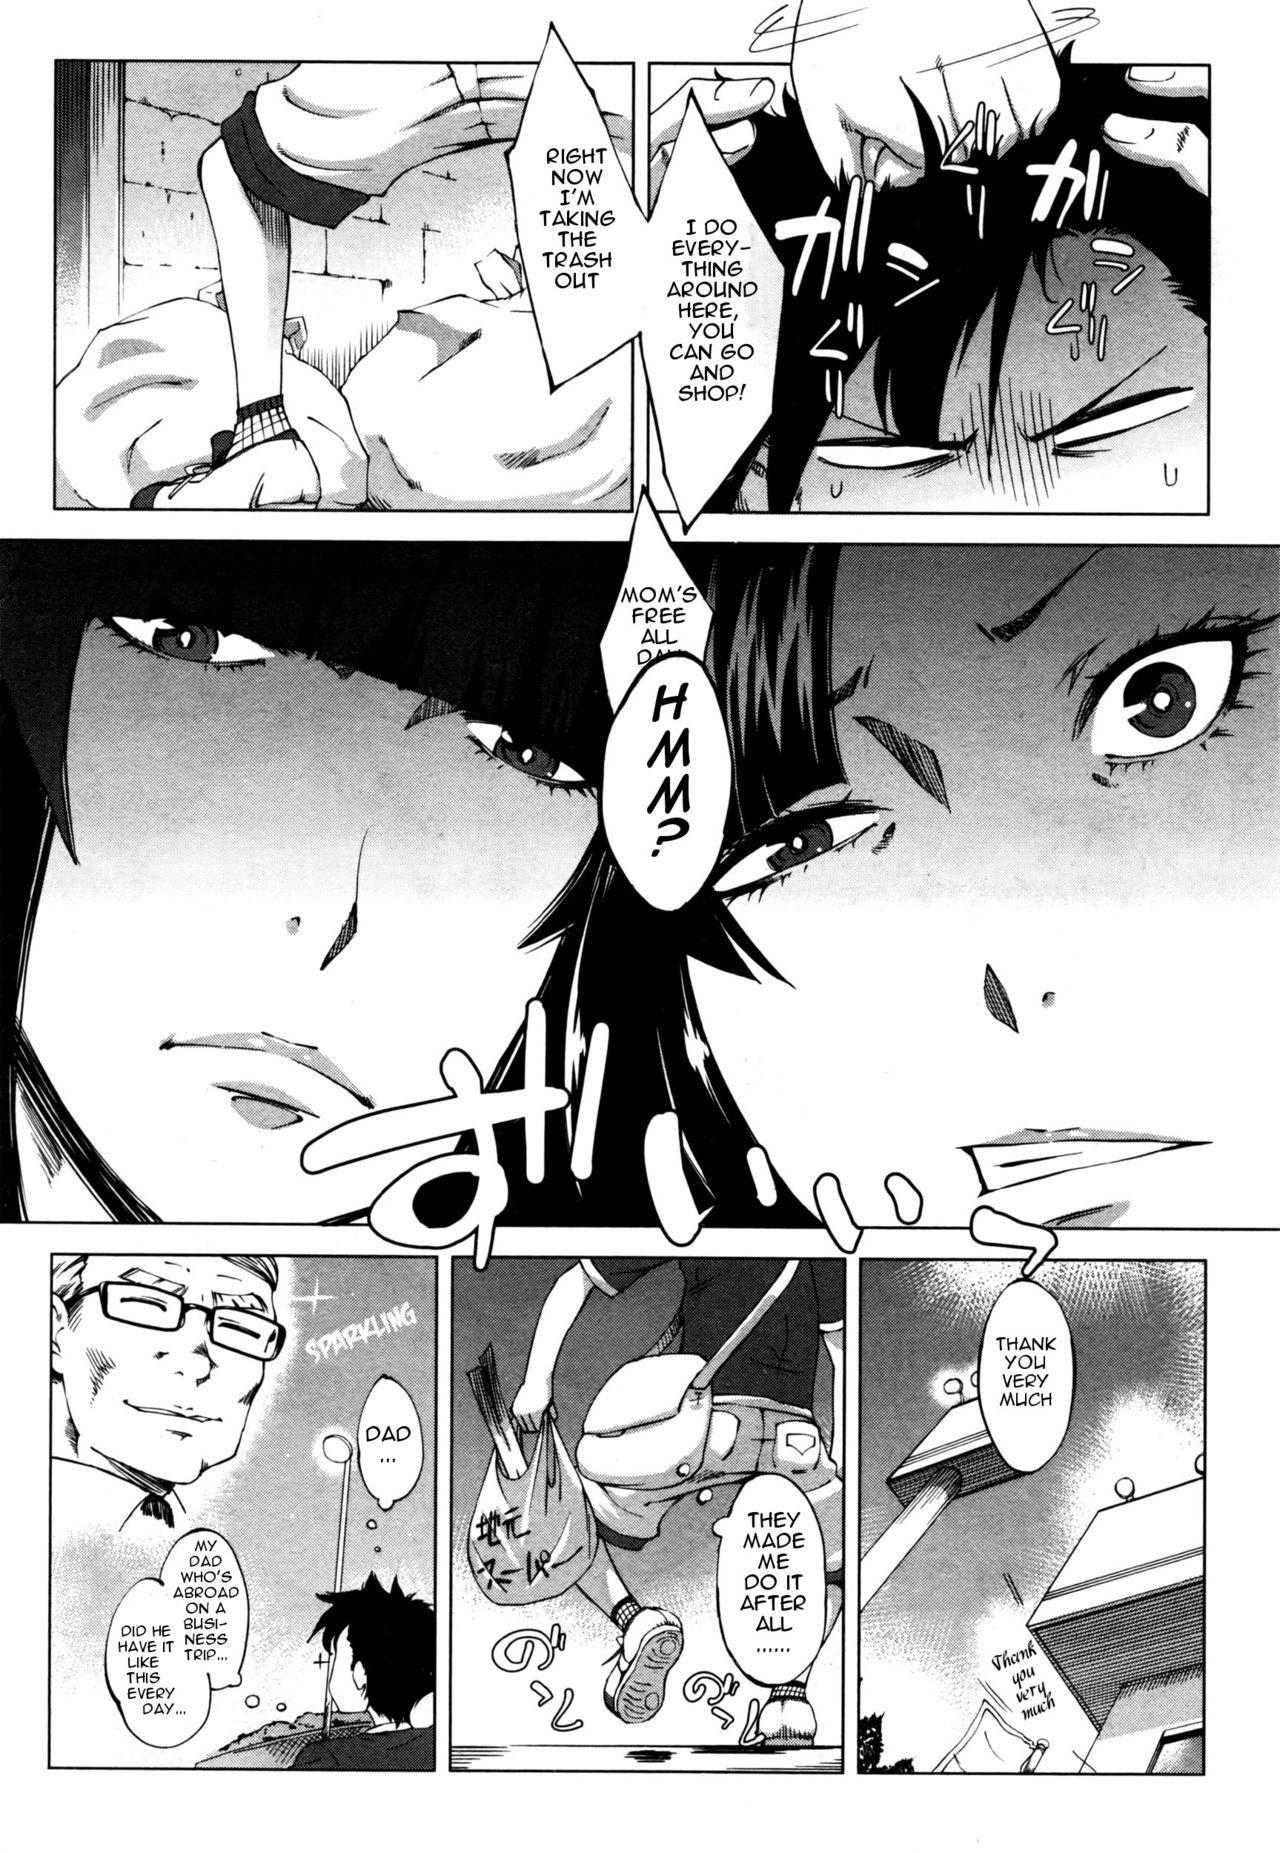 [Qdou Kei] Kaa-chan to Nee-chan ga Hidoin da yo | My mom and big sister are cruel (COMIC MILF 2016-08 Vol. 31) [English] [Januz] 3